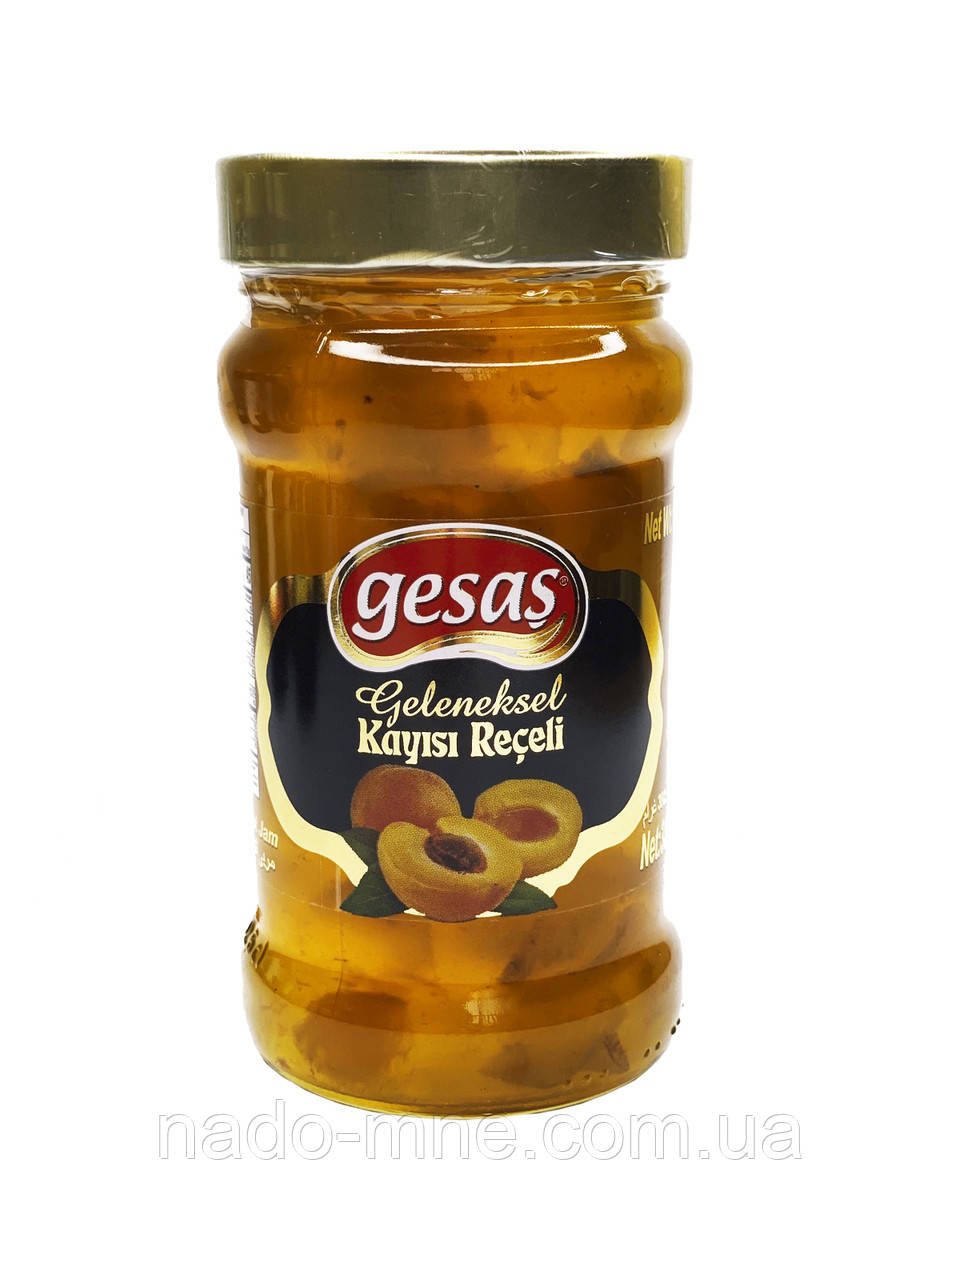 Абрикосовый джем Gesas, Турция 380 гр.